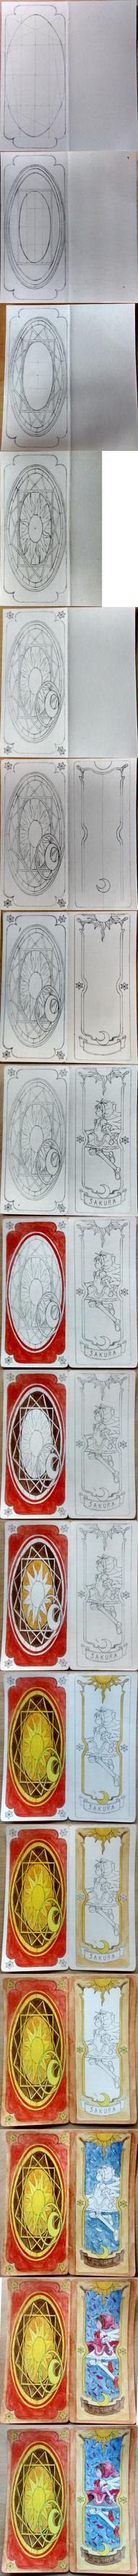 Sakura Card Captor - Birthday card (WIP) by near43